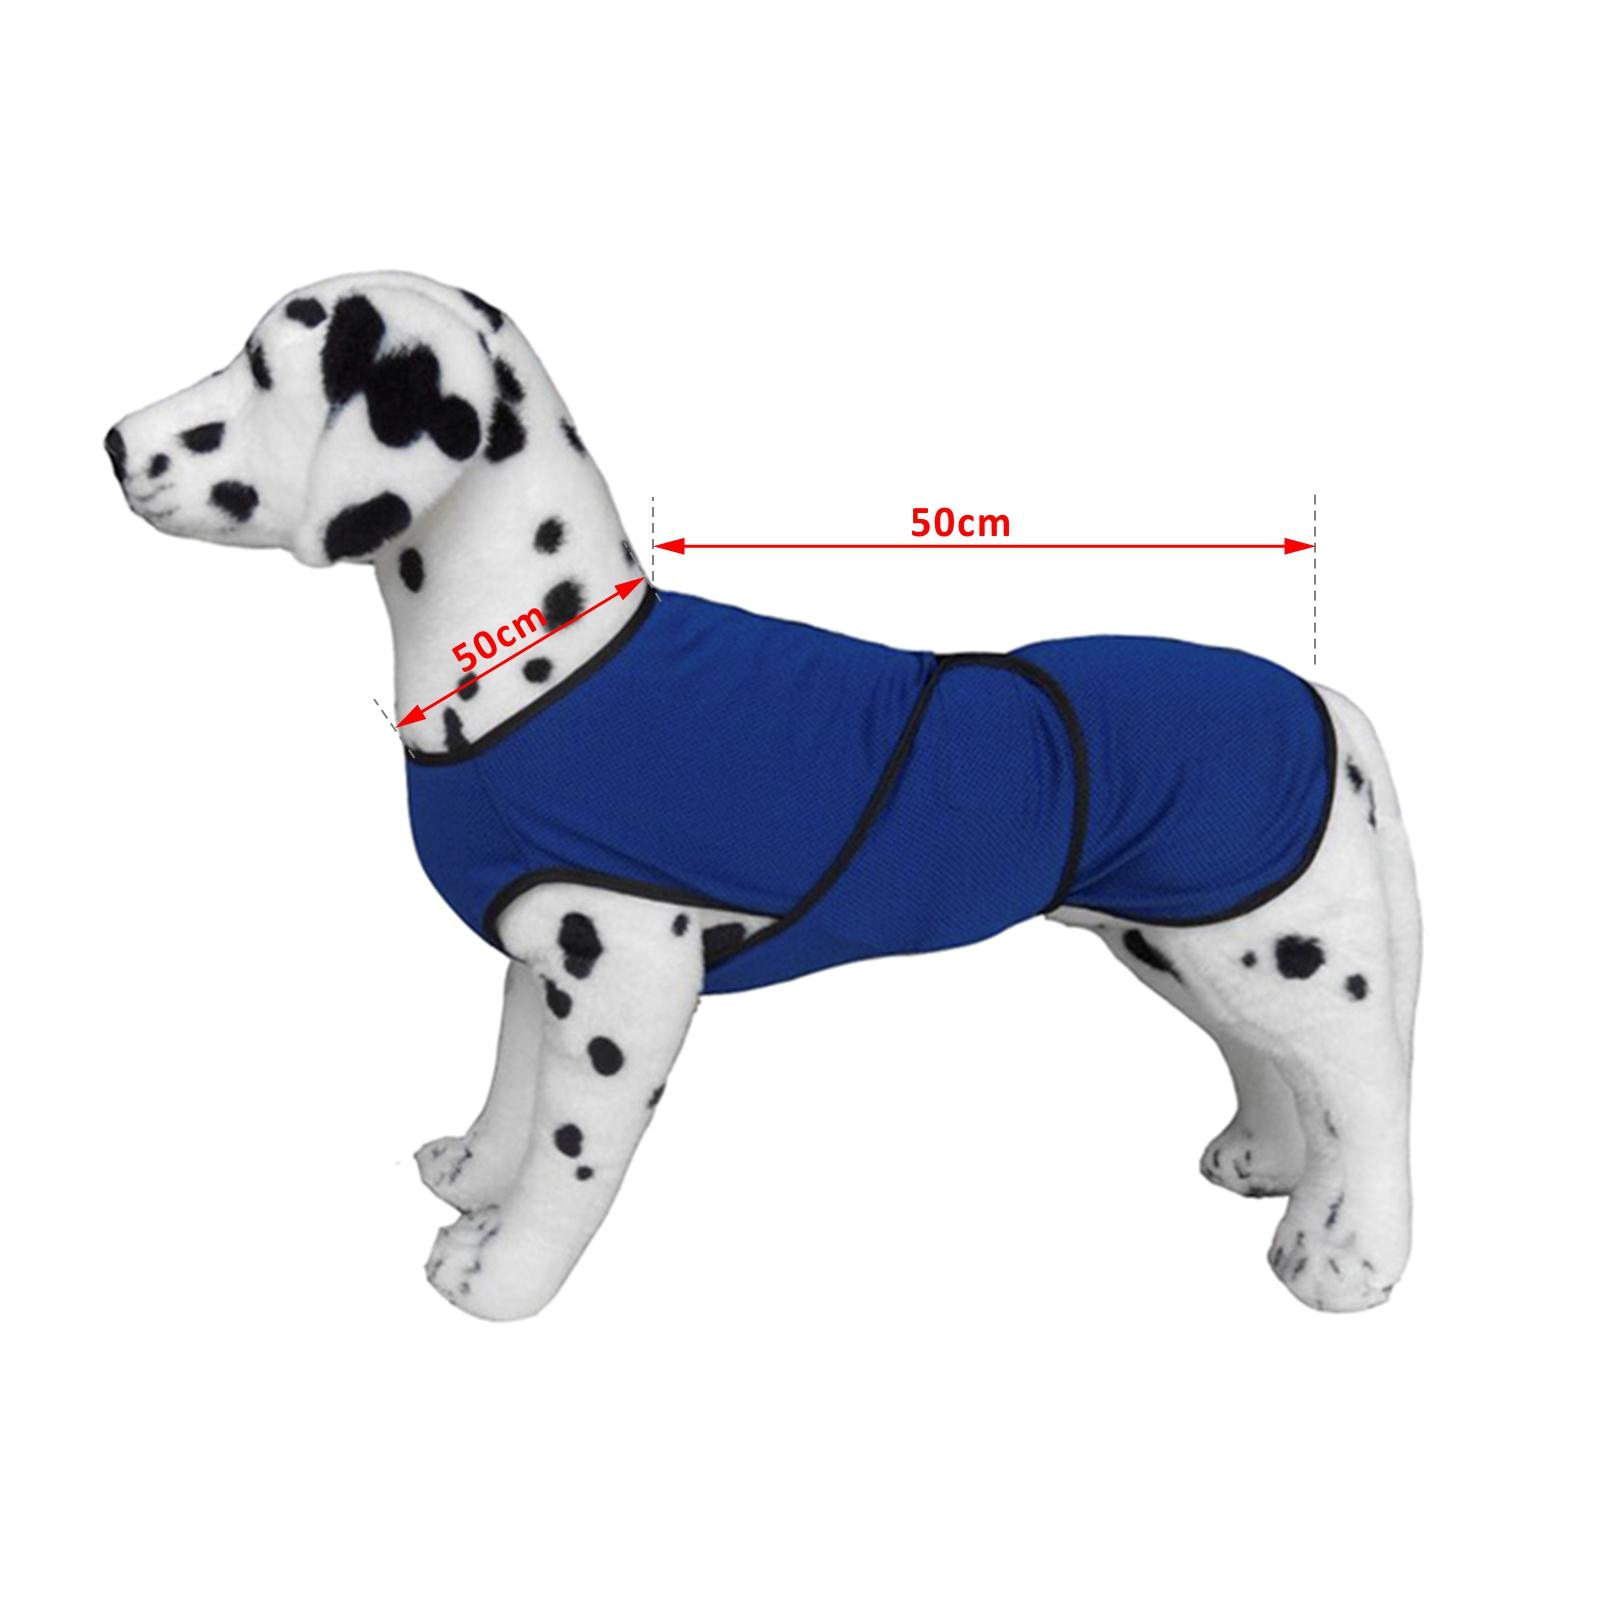 Chaqueta-Chaleco-de-Refrigeracion-Perro-Ropa-de-Verano-Chaleco-para-Mascotas miniatura 15